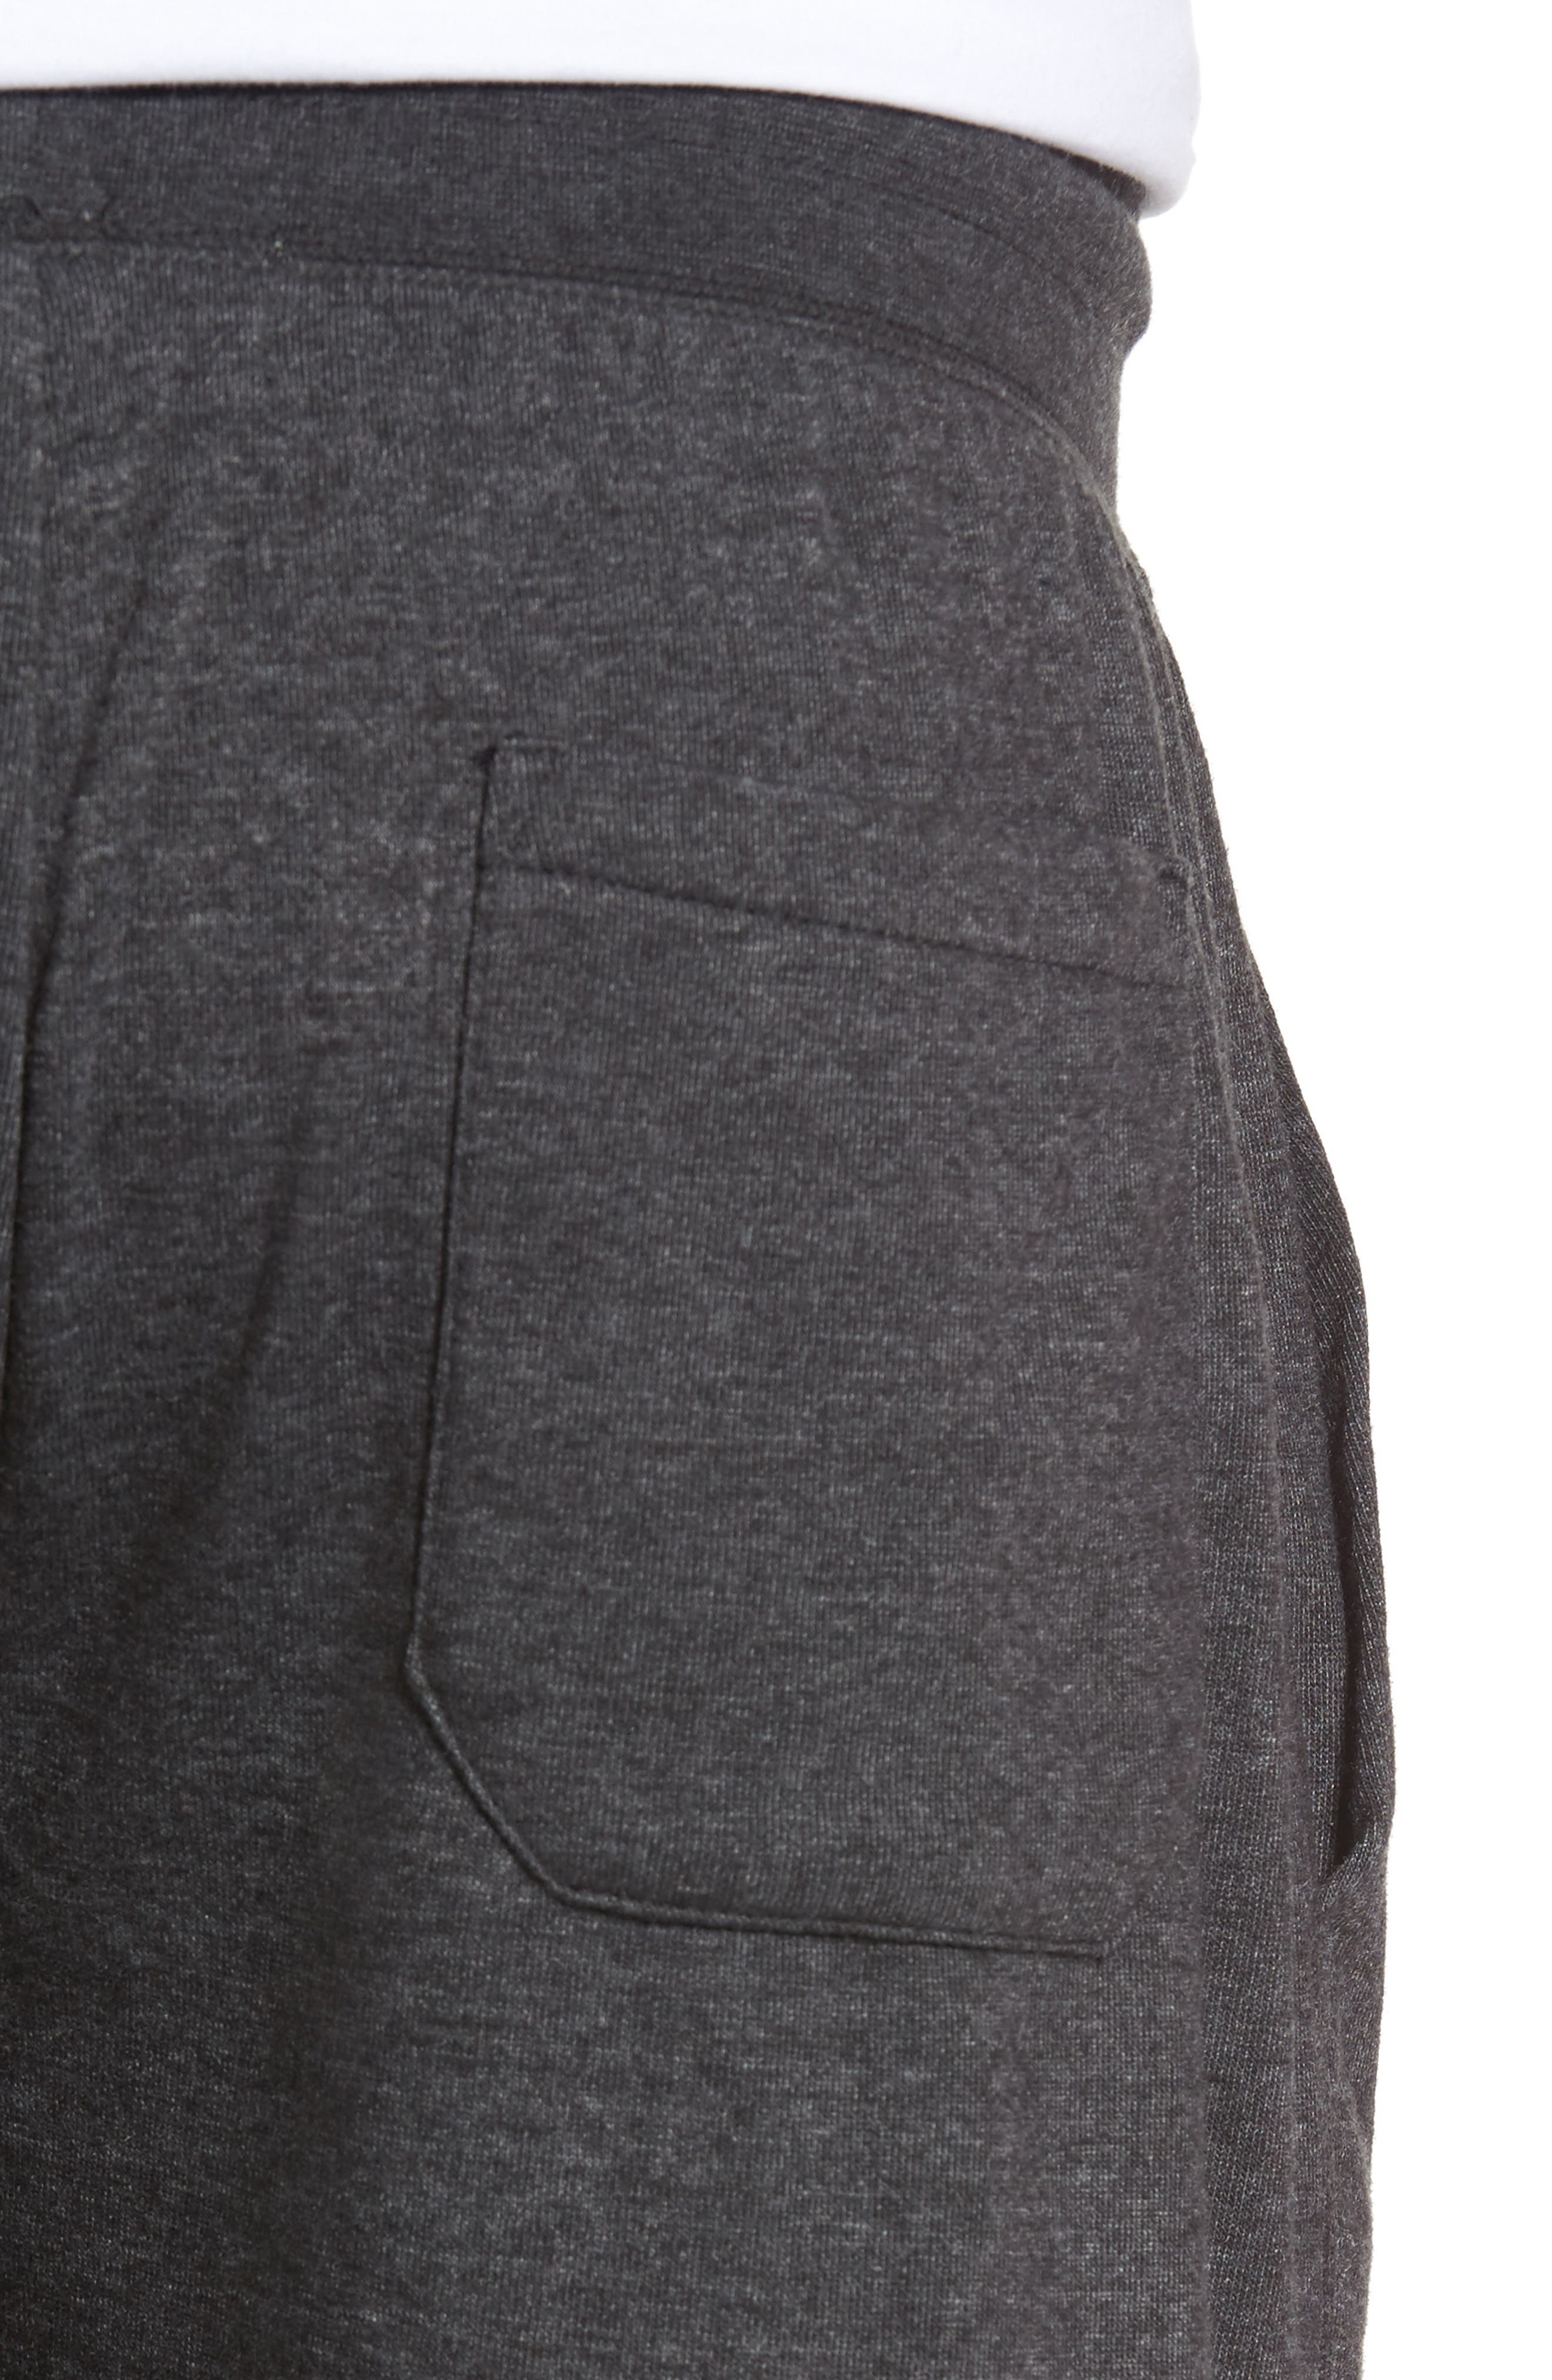 Fleece Shorts,                             Alternate thumbnail 4, color,                             030